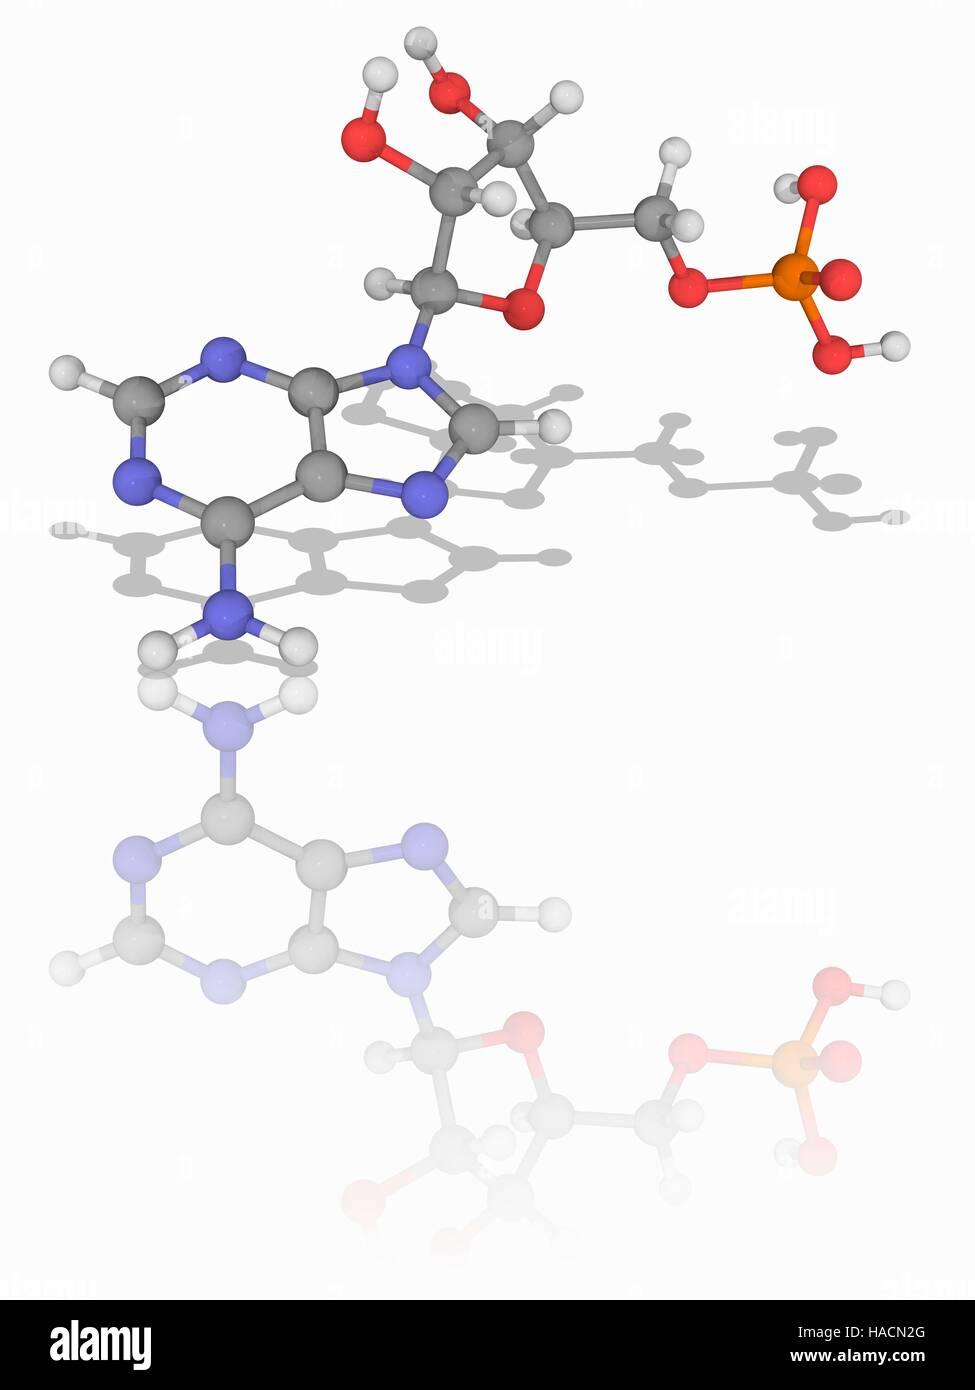 Adenosine monophosphate. Molecular model of the nucleic acid subunit adenosine monophosphate (AMP, C10.H14.N5.O7.P). Stock Photo